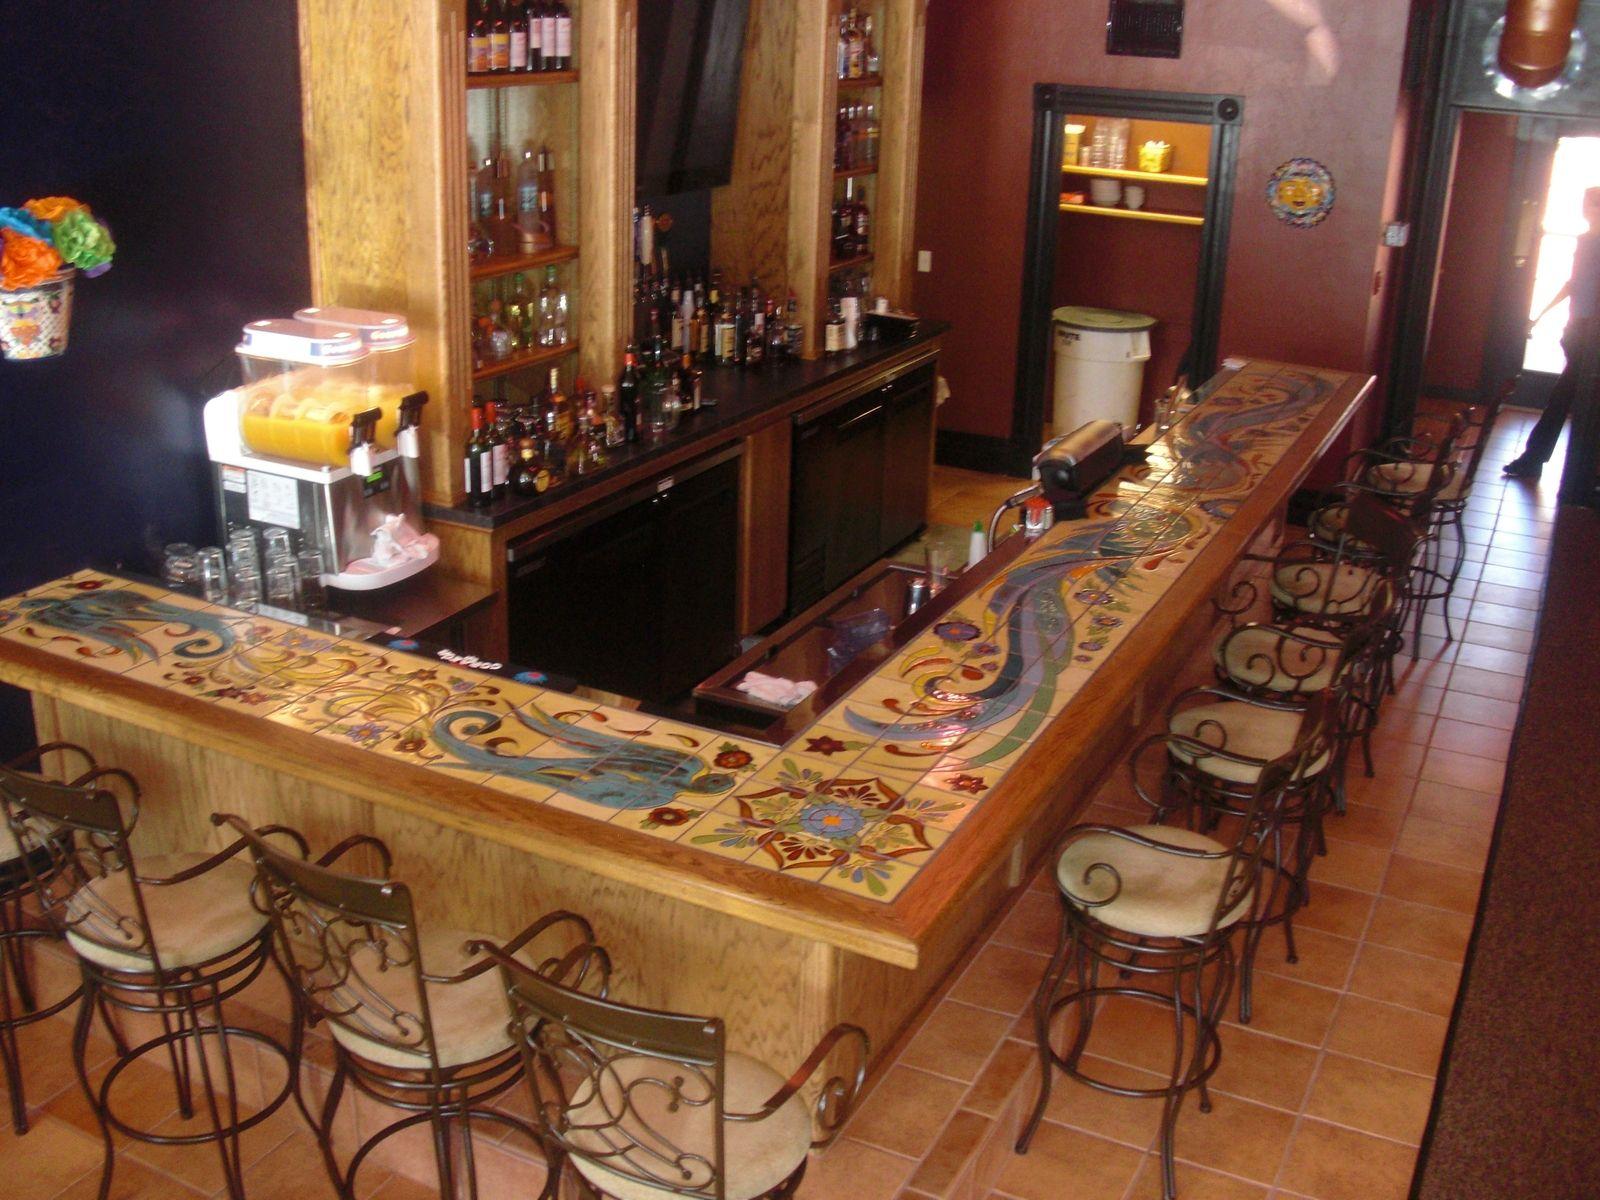 Custom Hand Glazed Tile Bartop  Products I Love  Pinterest  Glazed tiles Bar and Basements